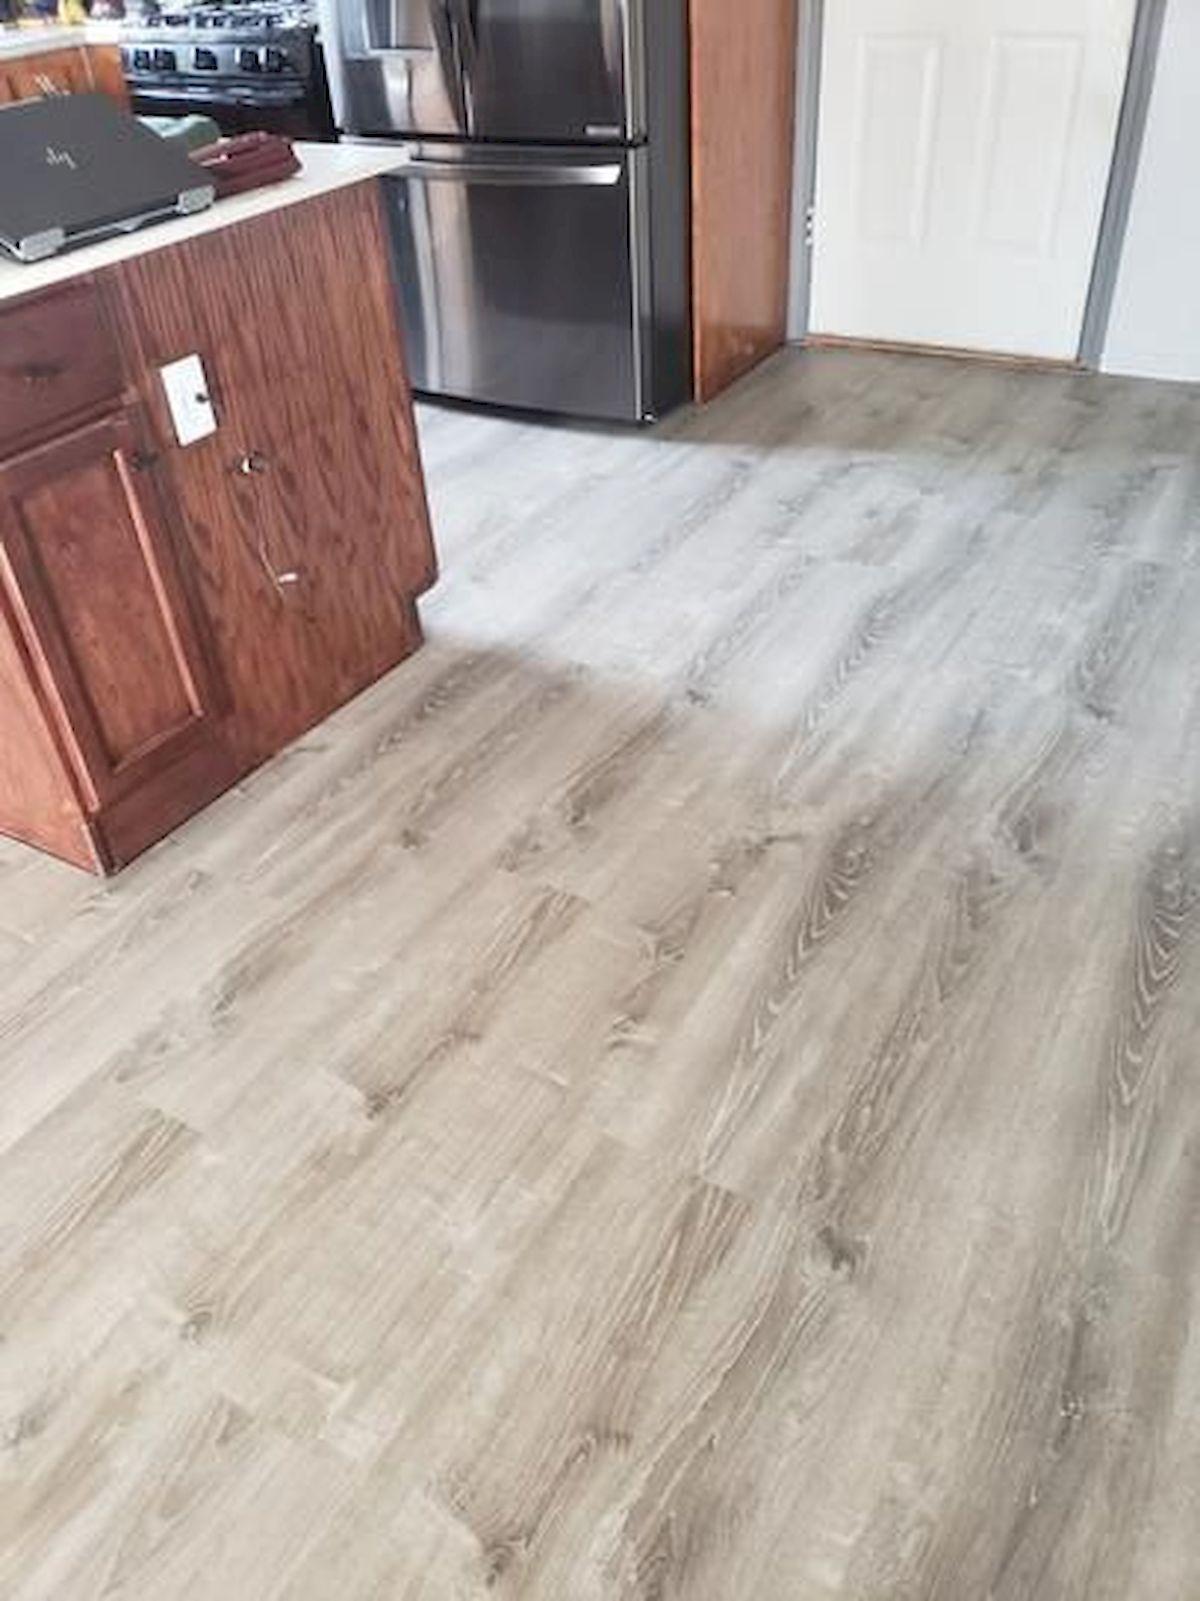 80 Hardwood Floor Ideas for Interior Home Vinyl